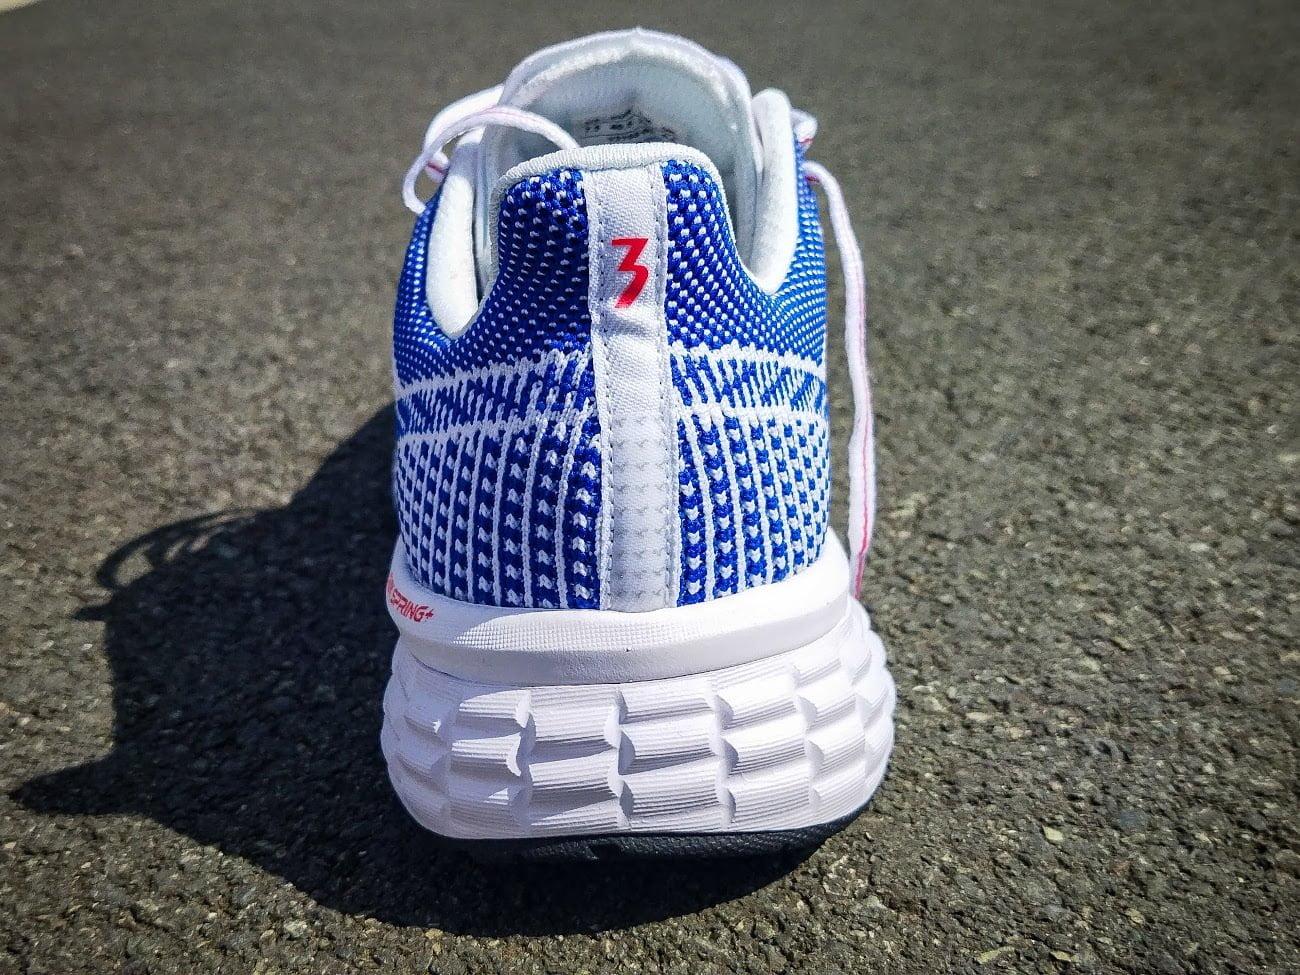 Chaussures running 361° 6